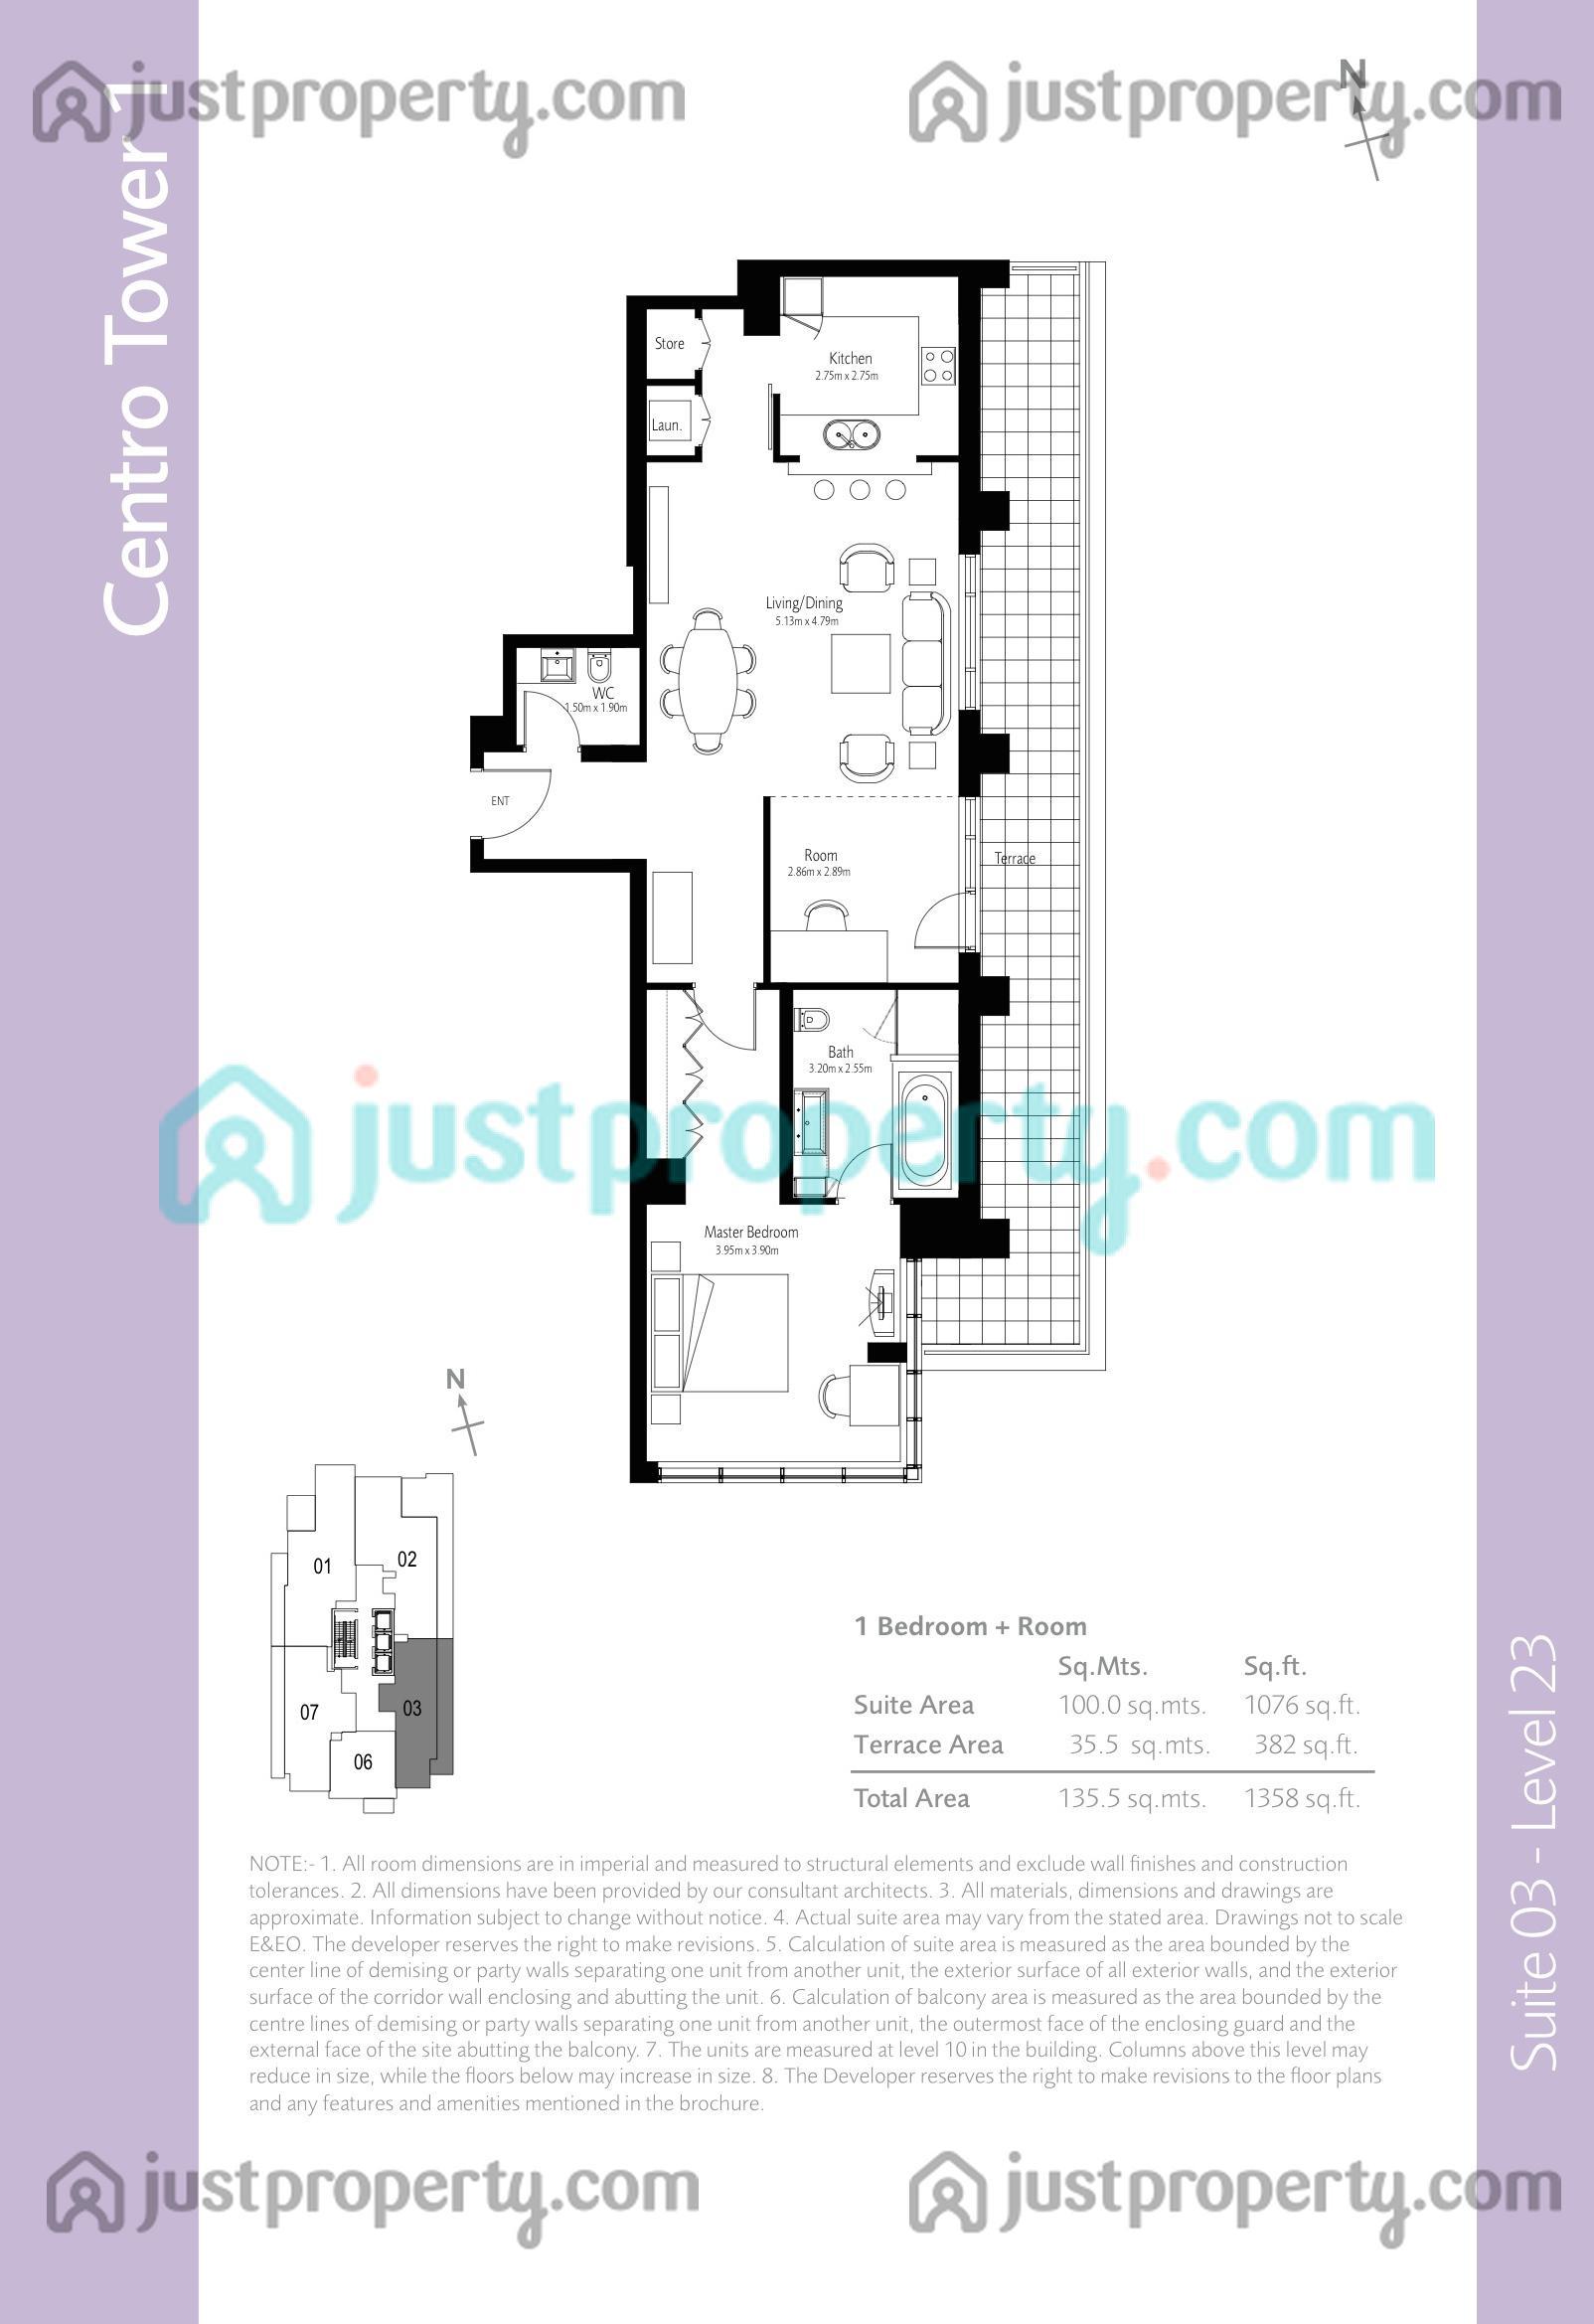 Boulevard central tower 1 floor plans for Bc floor plans